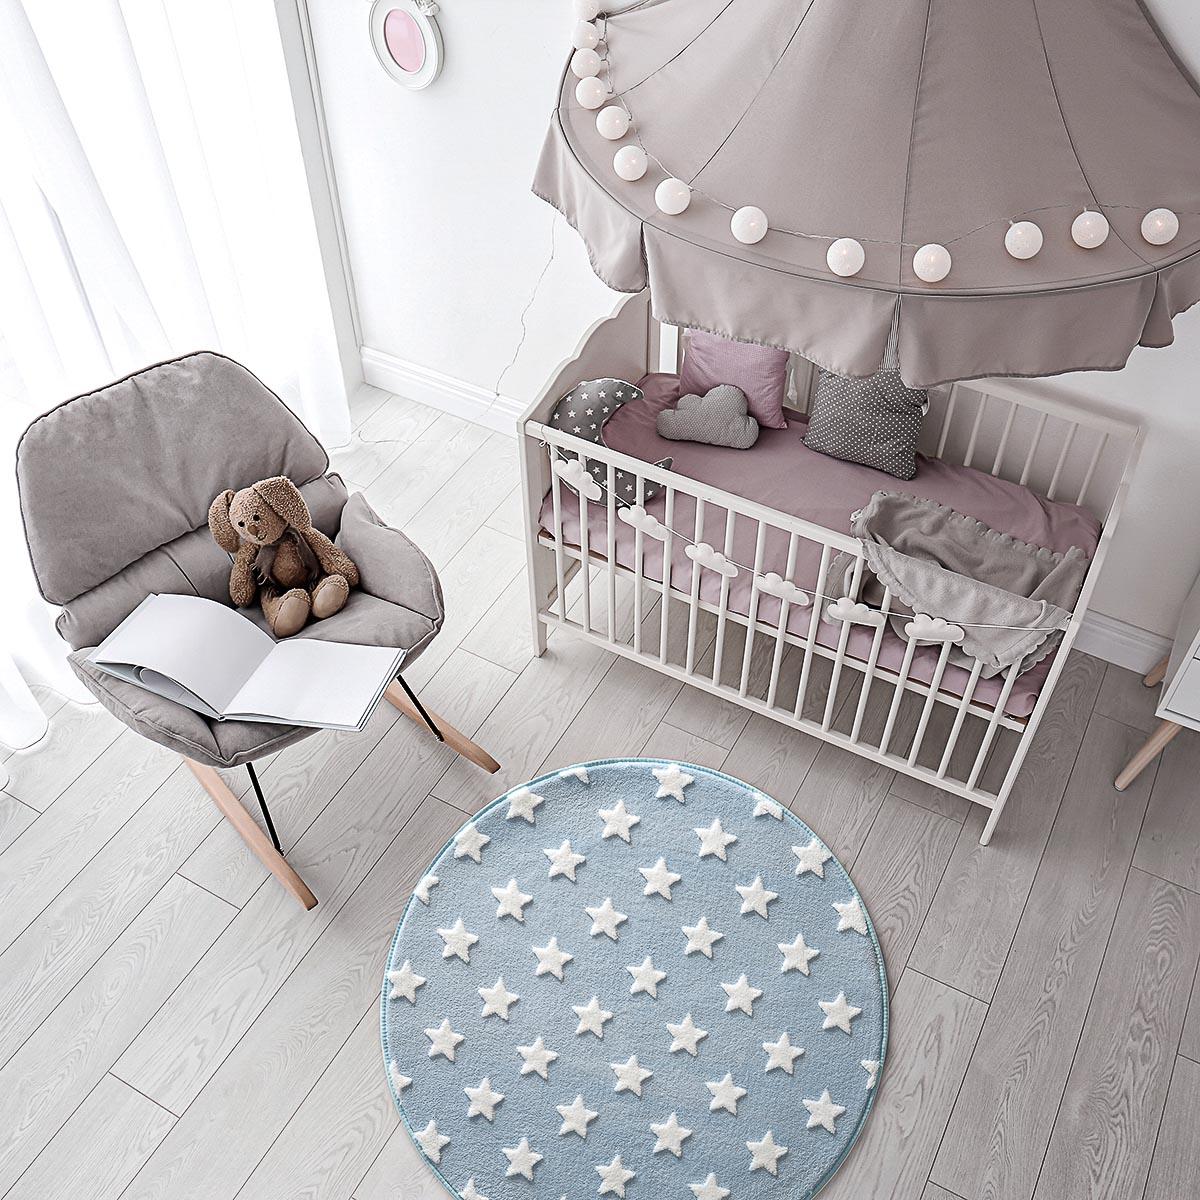 Tapete Infantil Quarto Bebê Antiderrapante Jolitex Mimo Redondo Estrelas Azul Menino